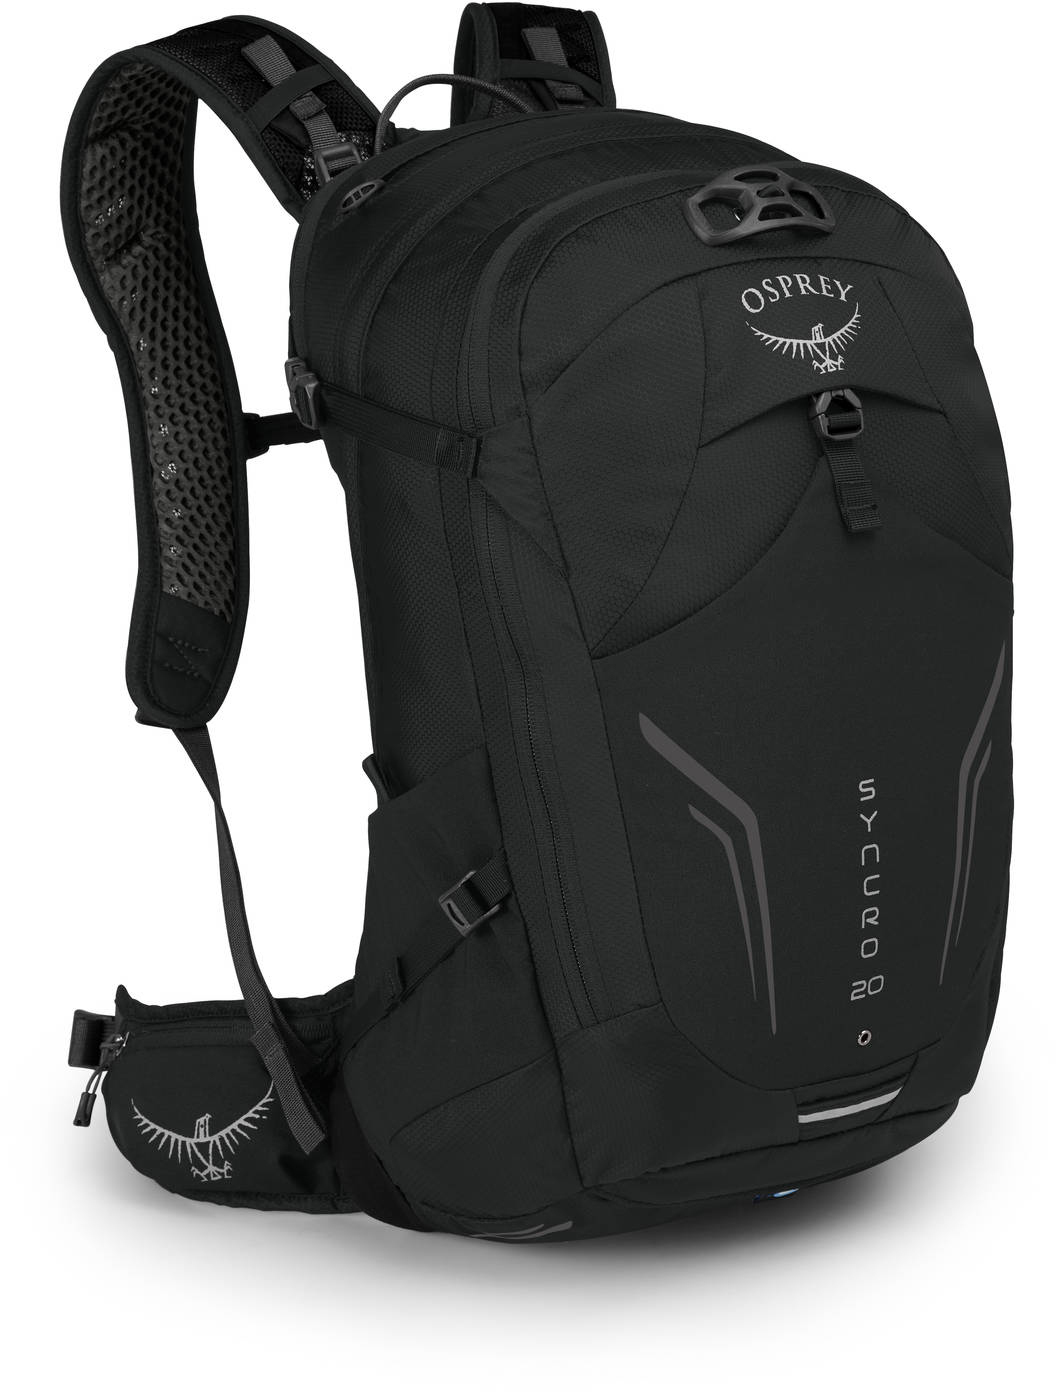 Велорюкзаки Рюкзак велосипедный Osprey Syncro 20 Black Syncro_20_S19_Side_Black_web.jpg